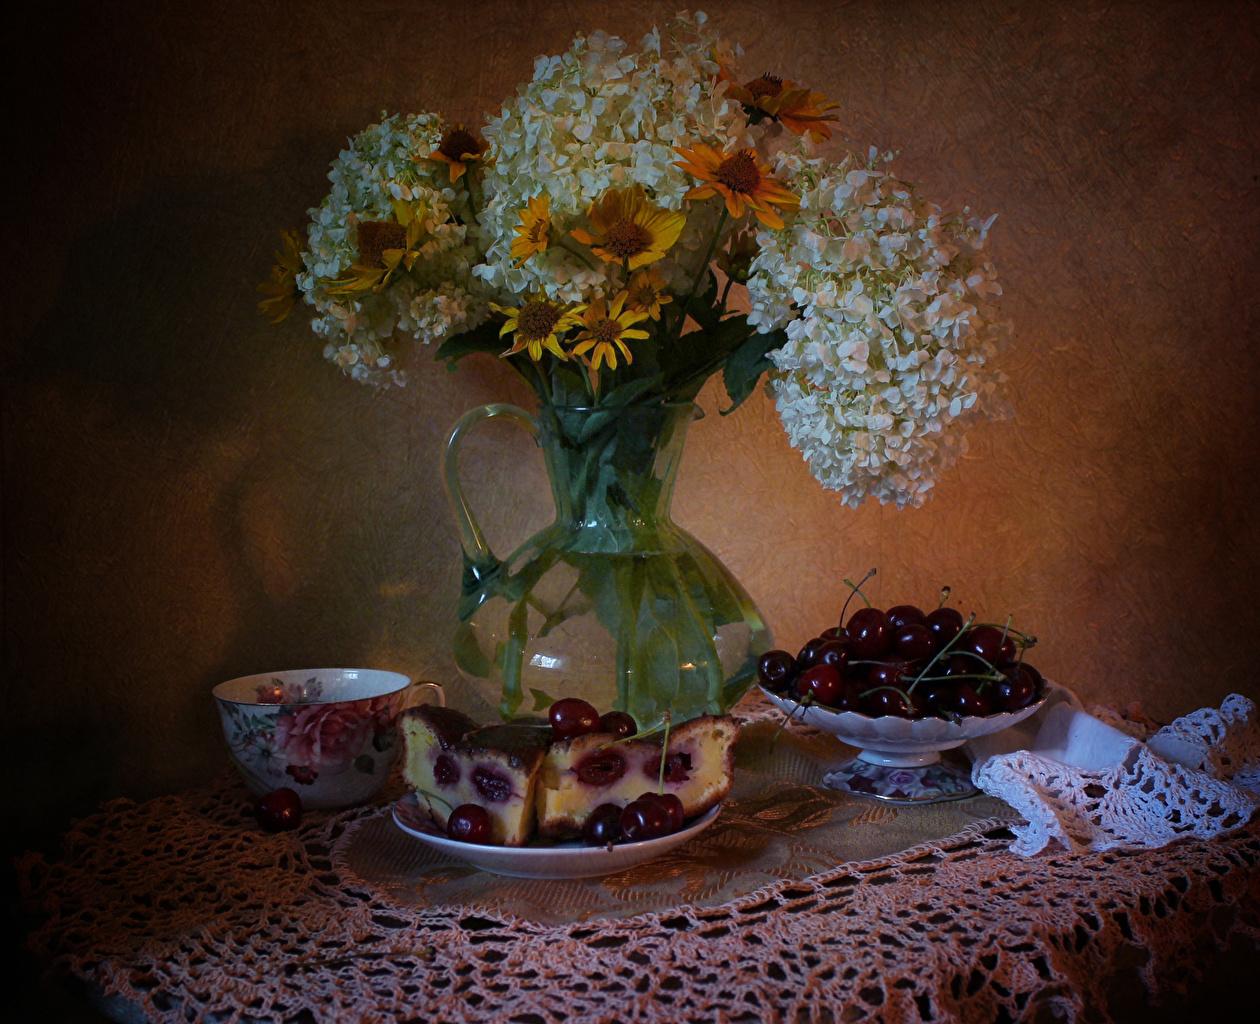 Image Pie Cherry pieces flower Gazania Hydrangea Cup Food Still-life Piece Flowers